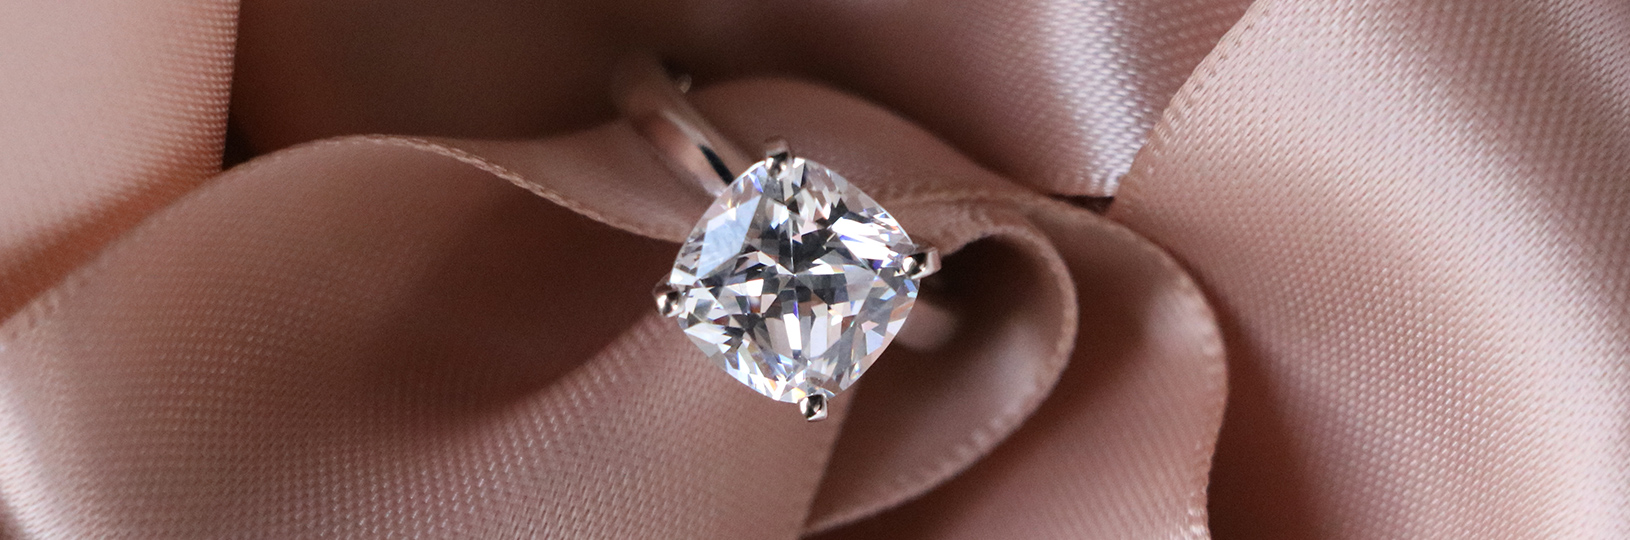 Cushion cut lab created diamond engagement ring.